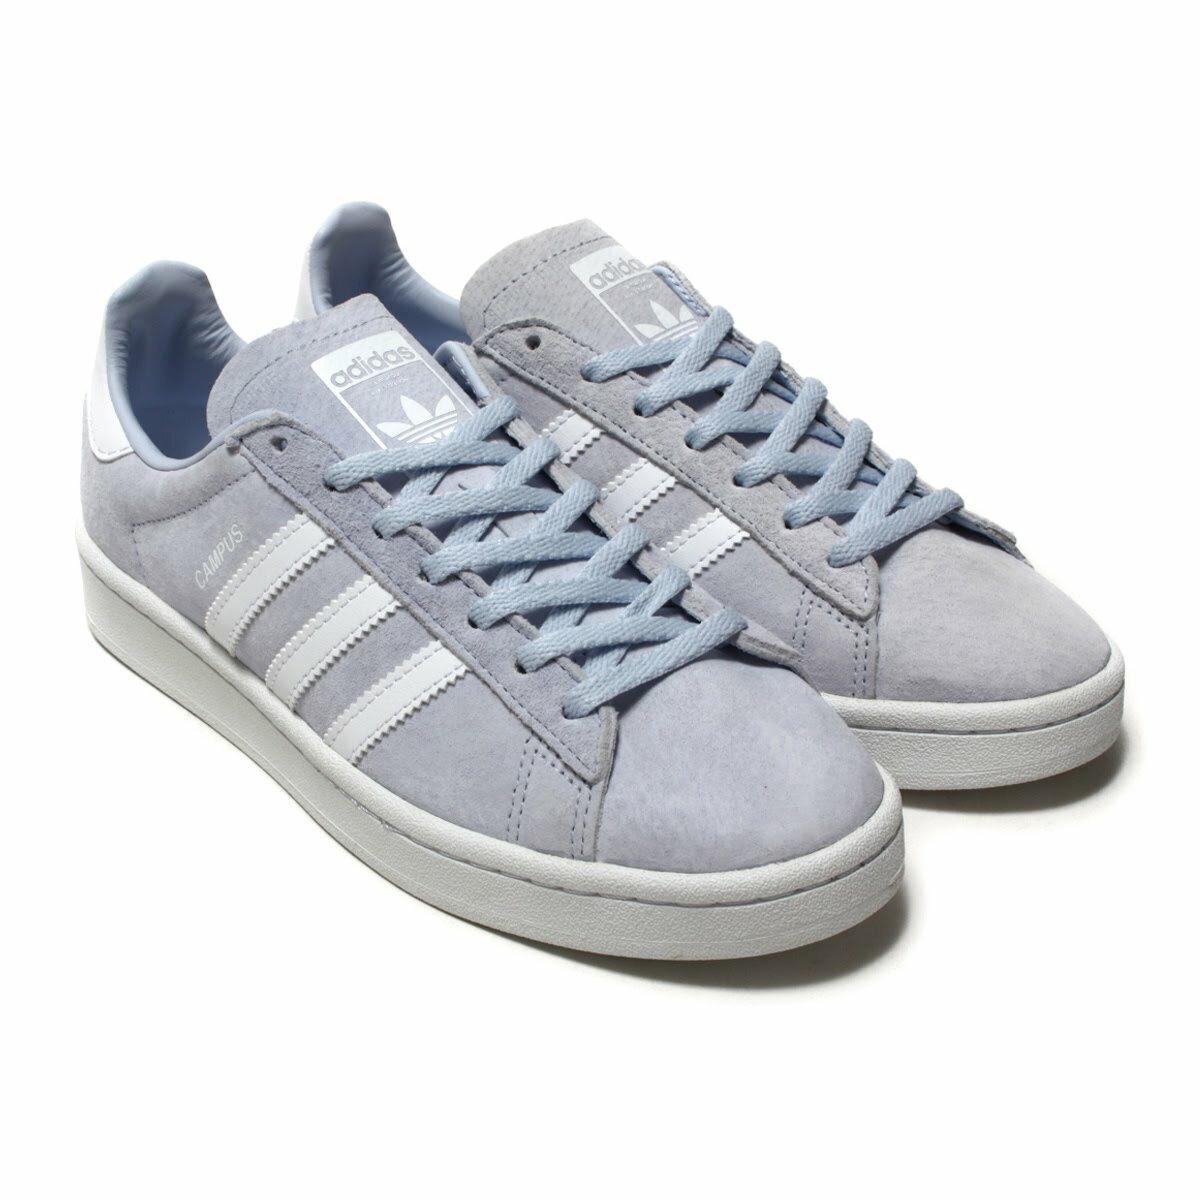 adidas Originals CAMPUS W(アディダス オリジナルス キャンパス W)Aero Blue/Running White/Crystal White18SS-I